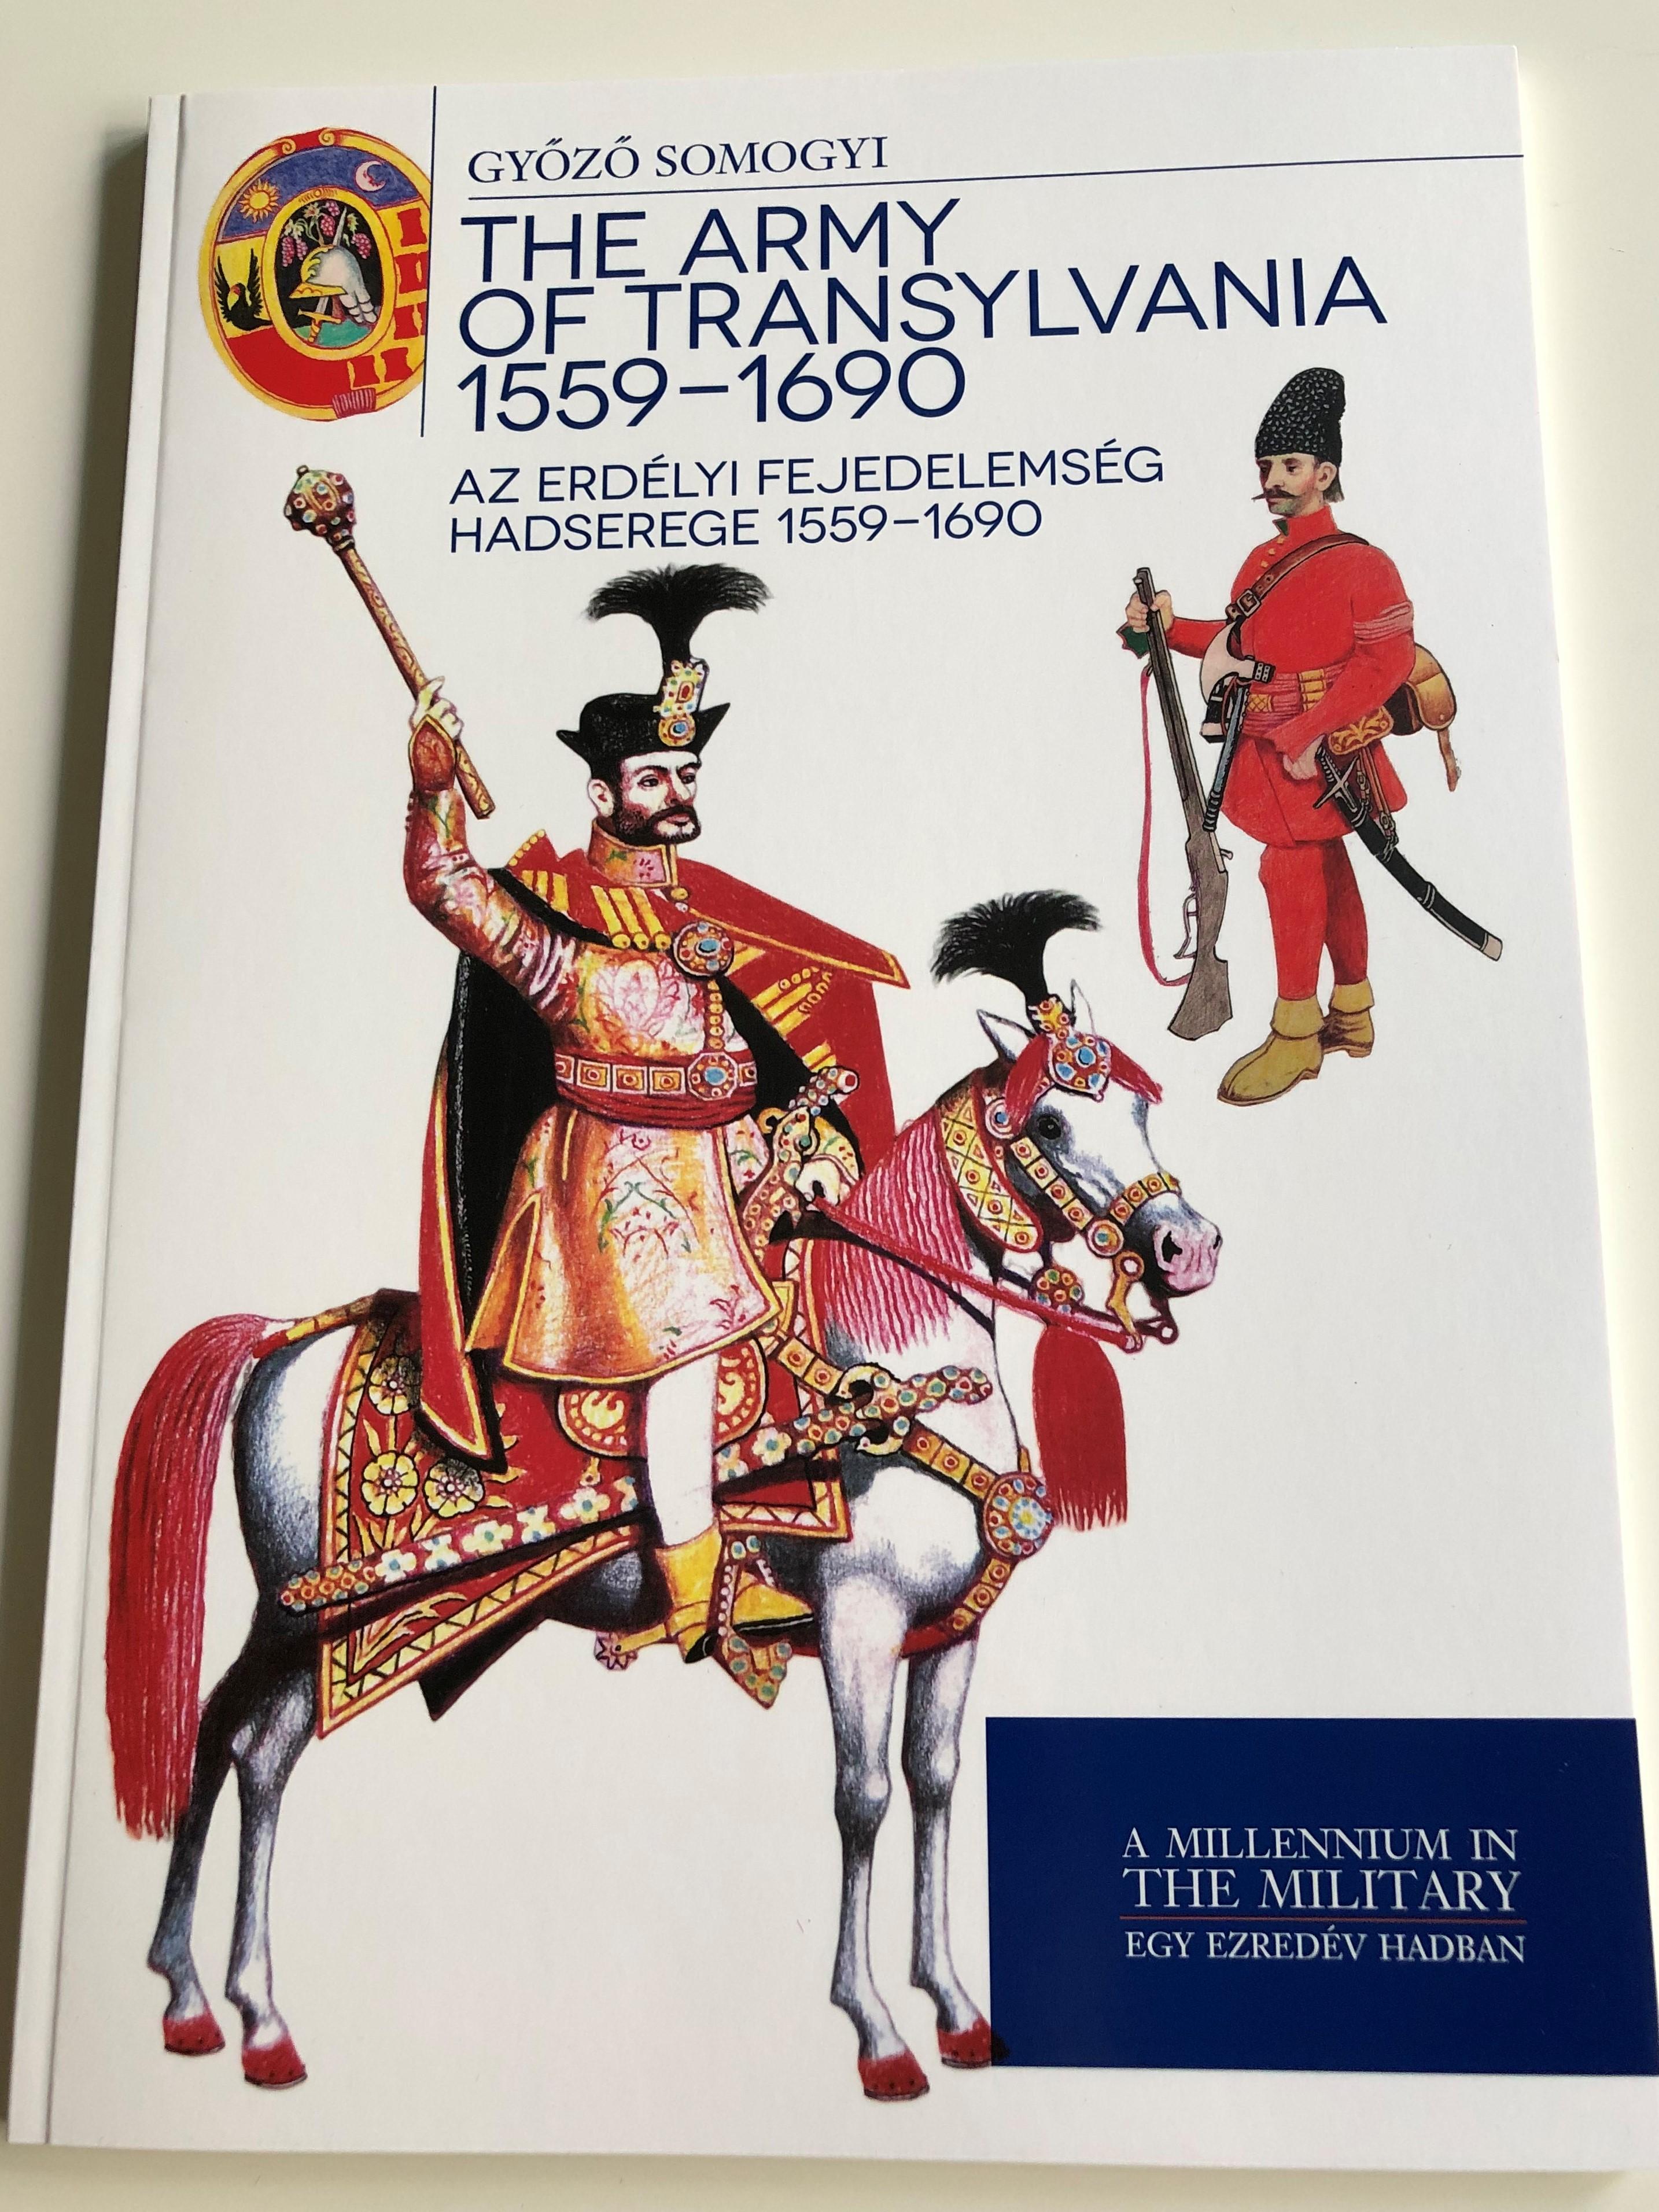 the-army-of-transylvania-1559-1690-by-gy-z-somogyi-az-erd-lyi-fejedelms-g-hadserege-1559-1690-h-bor-k-magyar-a-millenium-in-the-military-egy-ezred-v-hadban-paperback-2016-hm-zr-nyi-1-.jpg